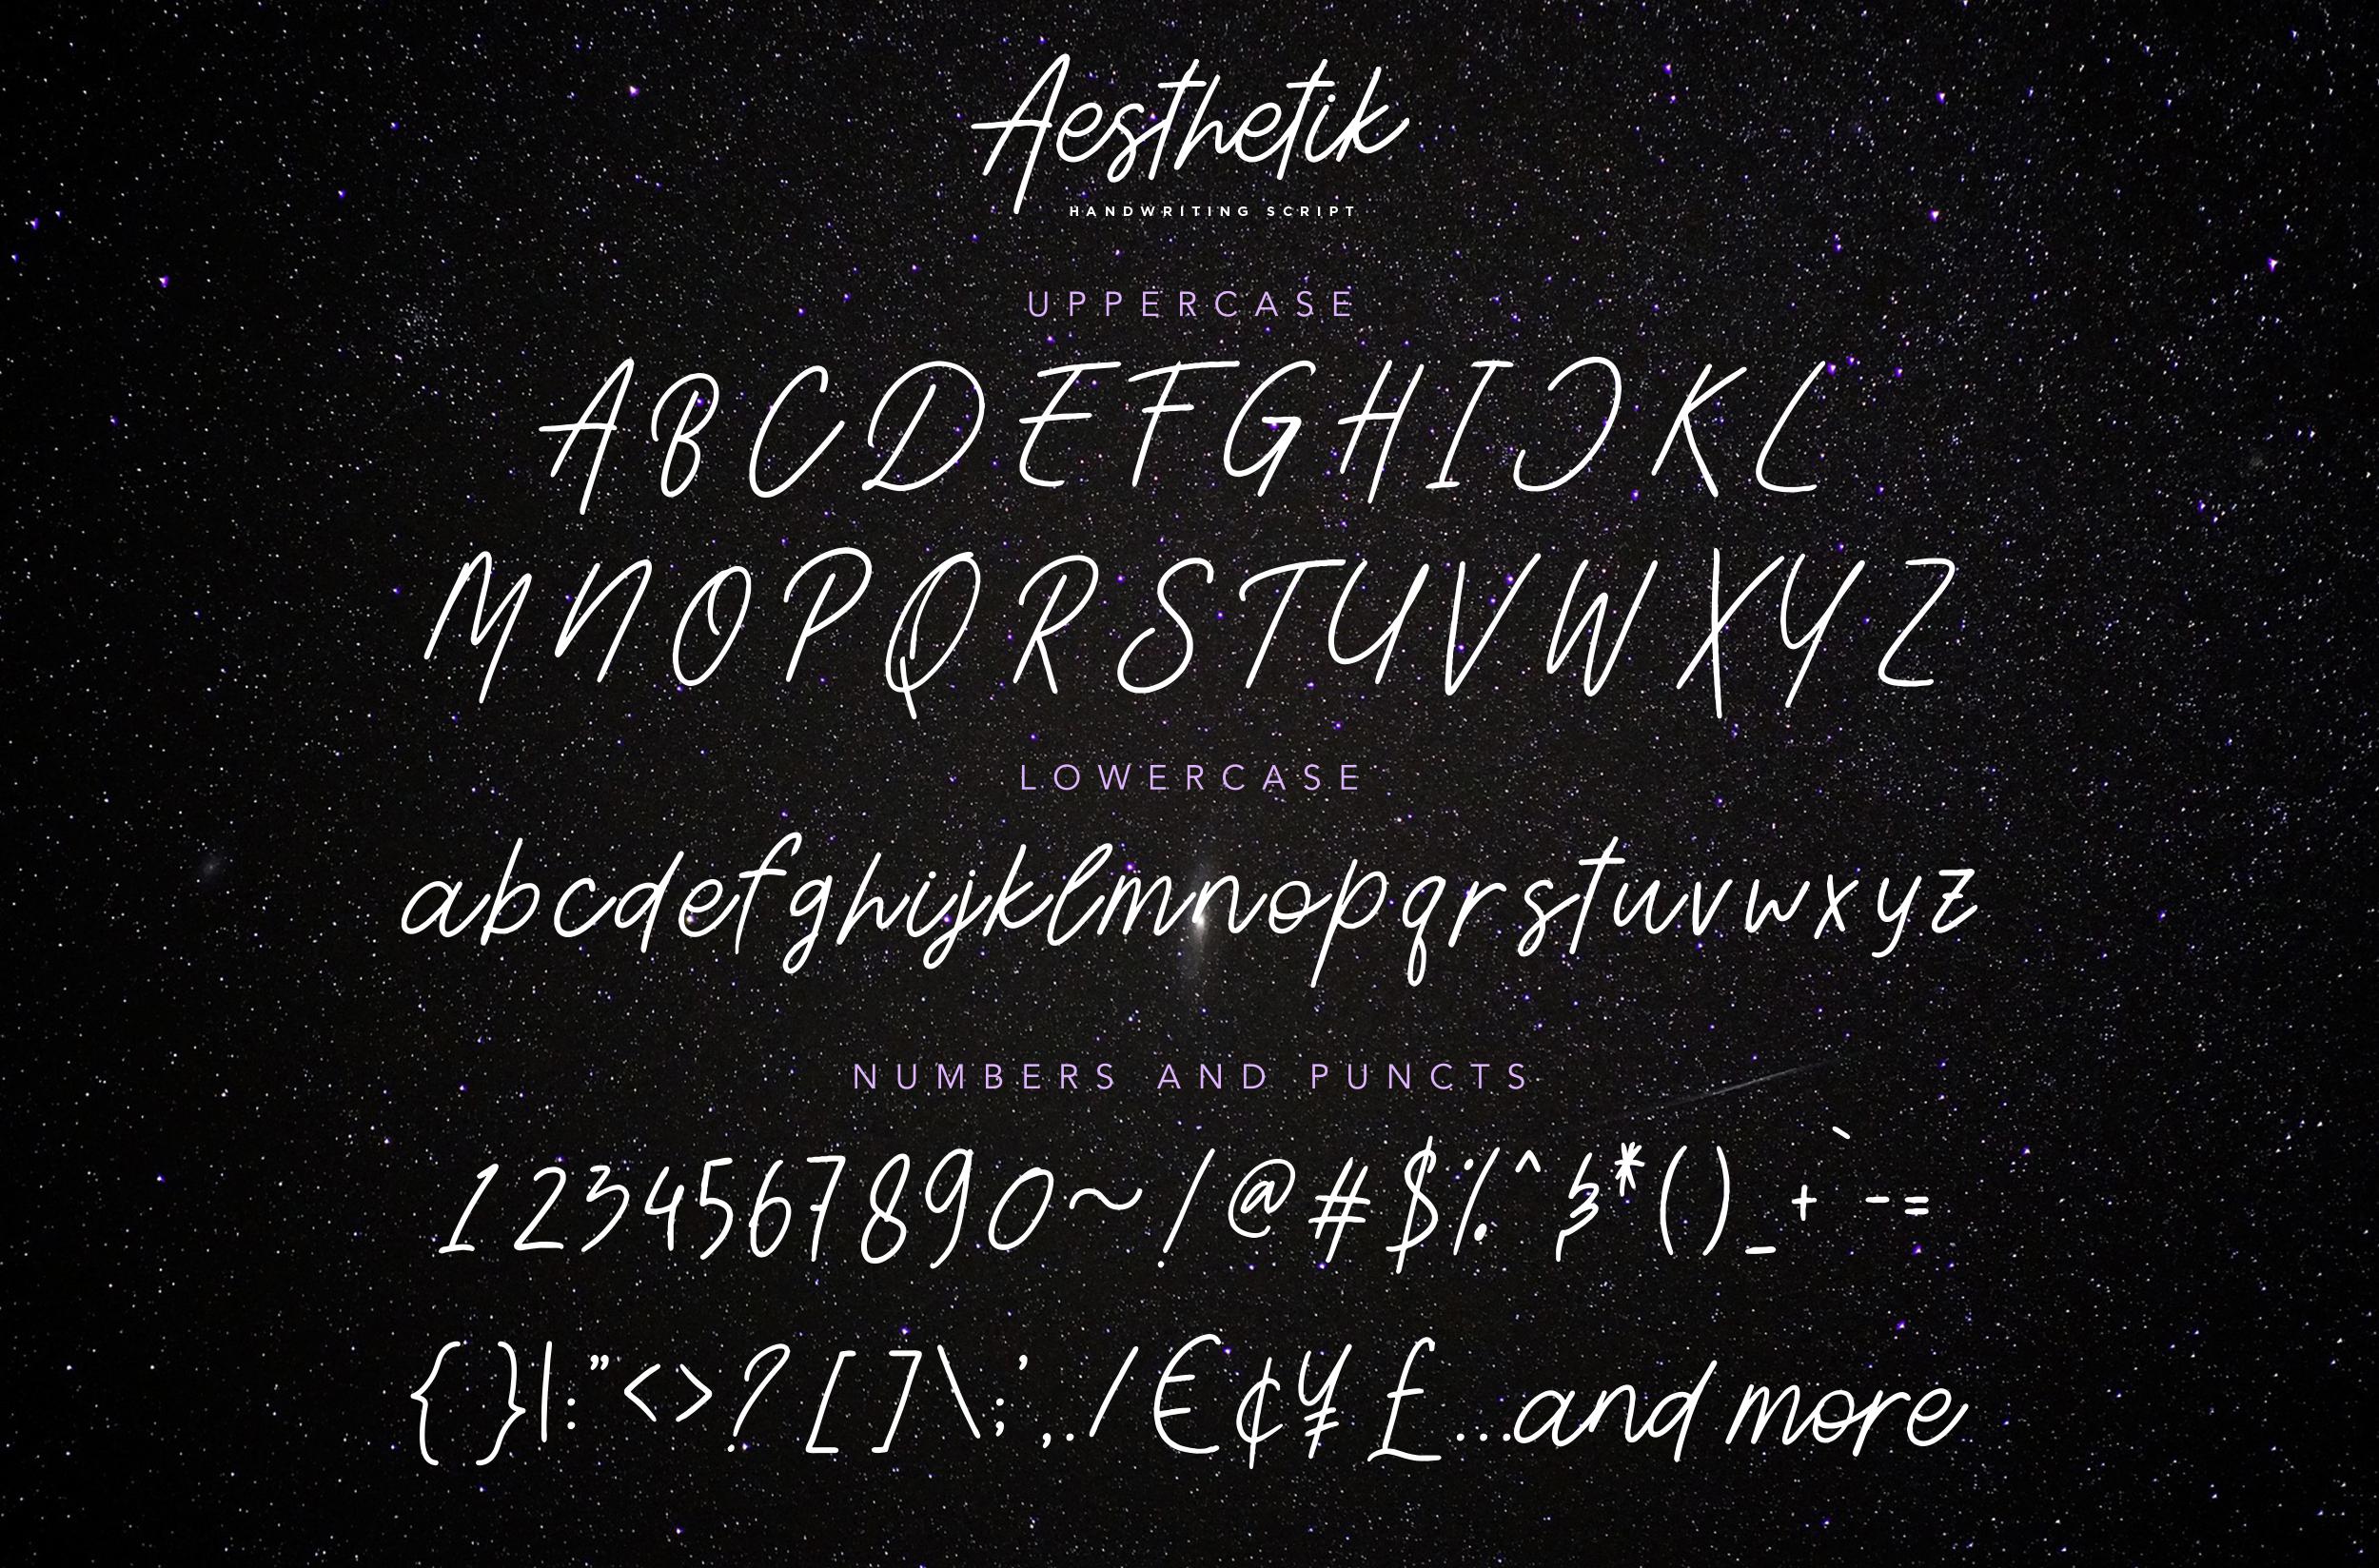 Aesthetik | Handwriting Font example image 8